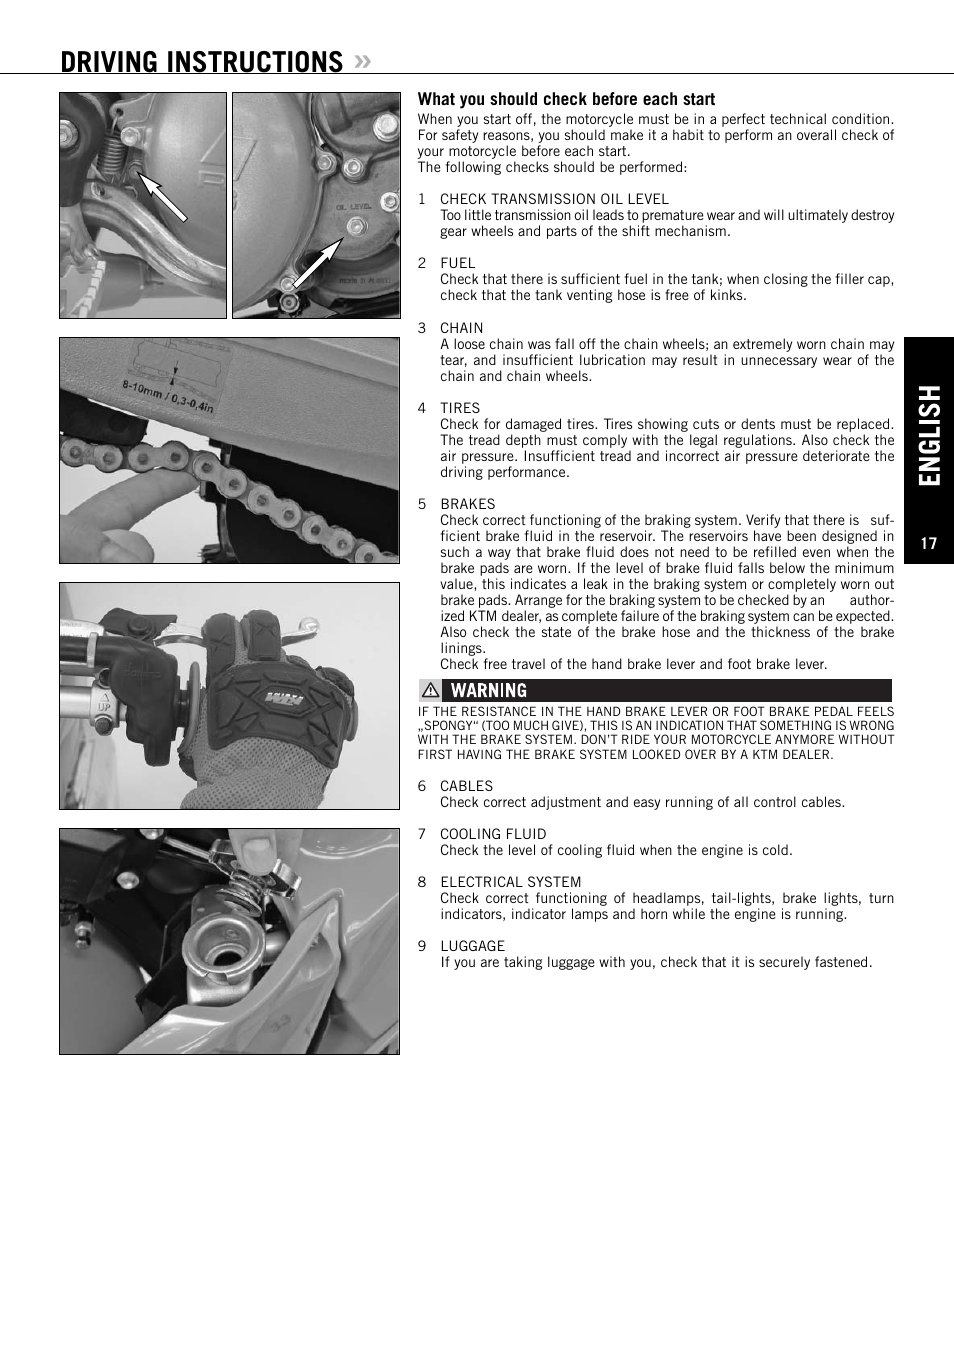 english driving instructions ktm xc w 250 sx user manual page rh manualsdir com 2017 ktm 250 sx owner's manual 2004 ktm 250 sx owner's manual